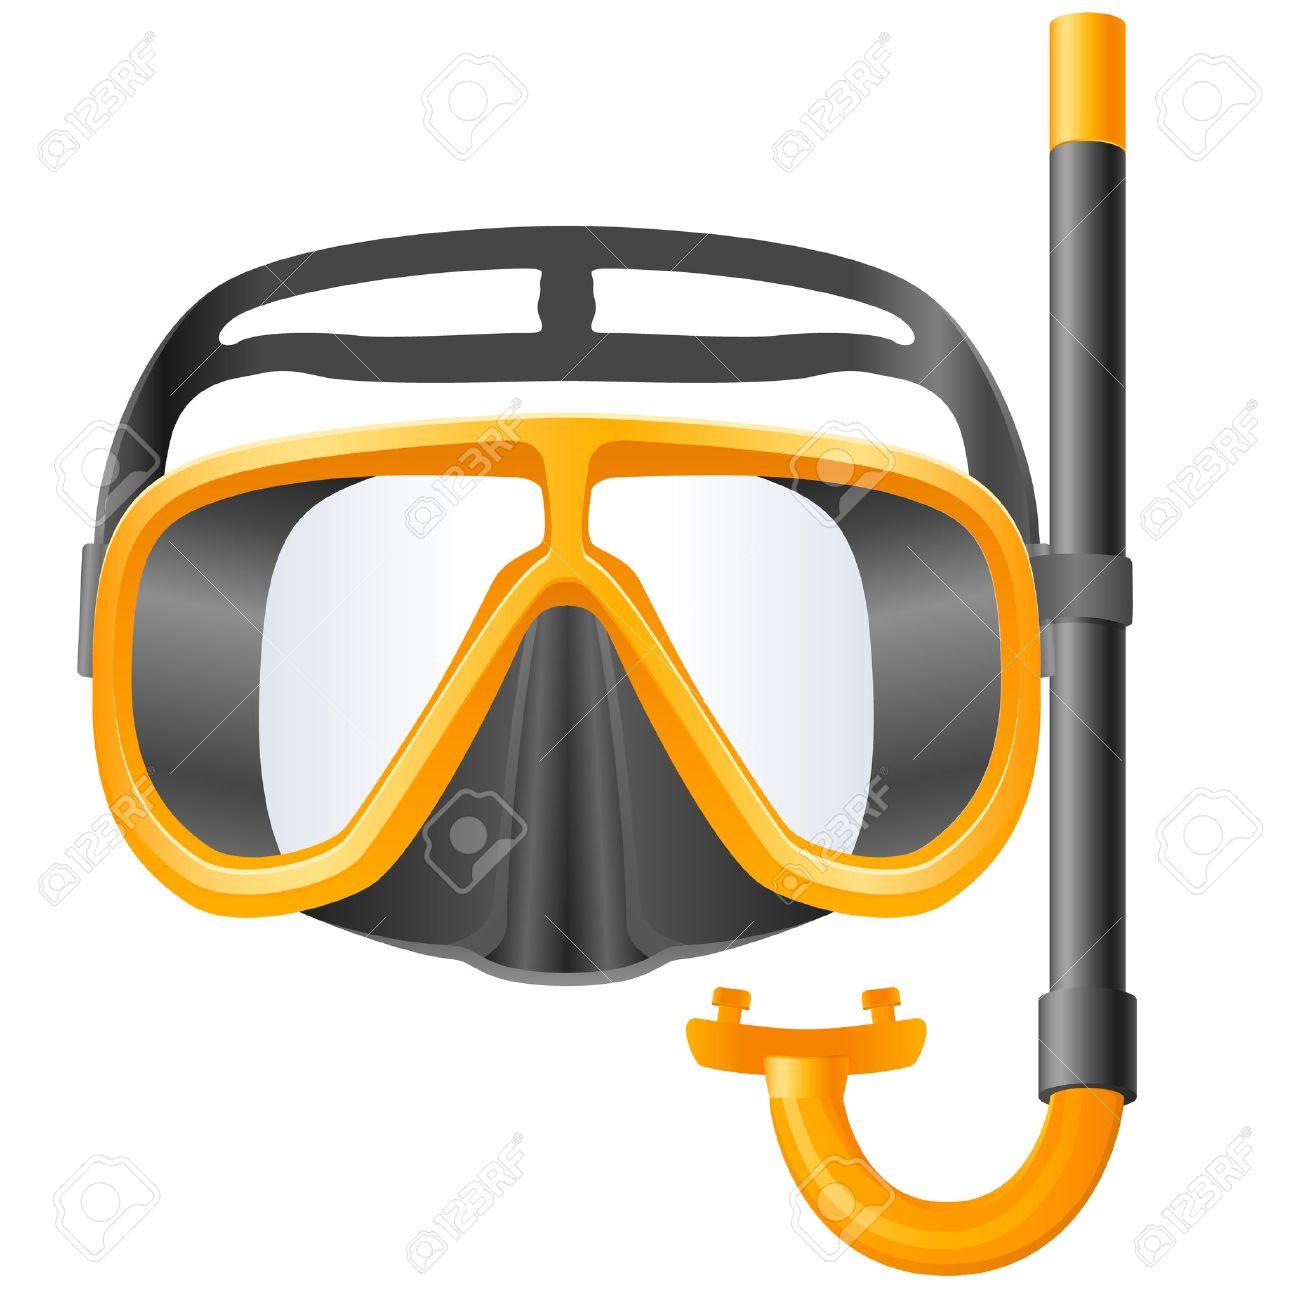 scuba mask and snorkel.